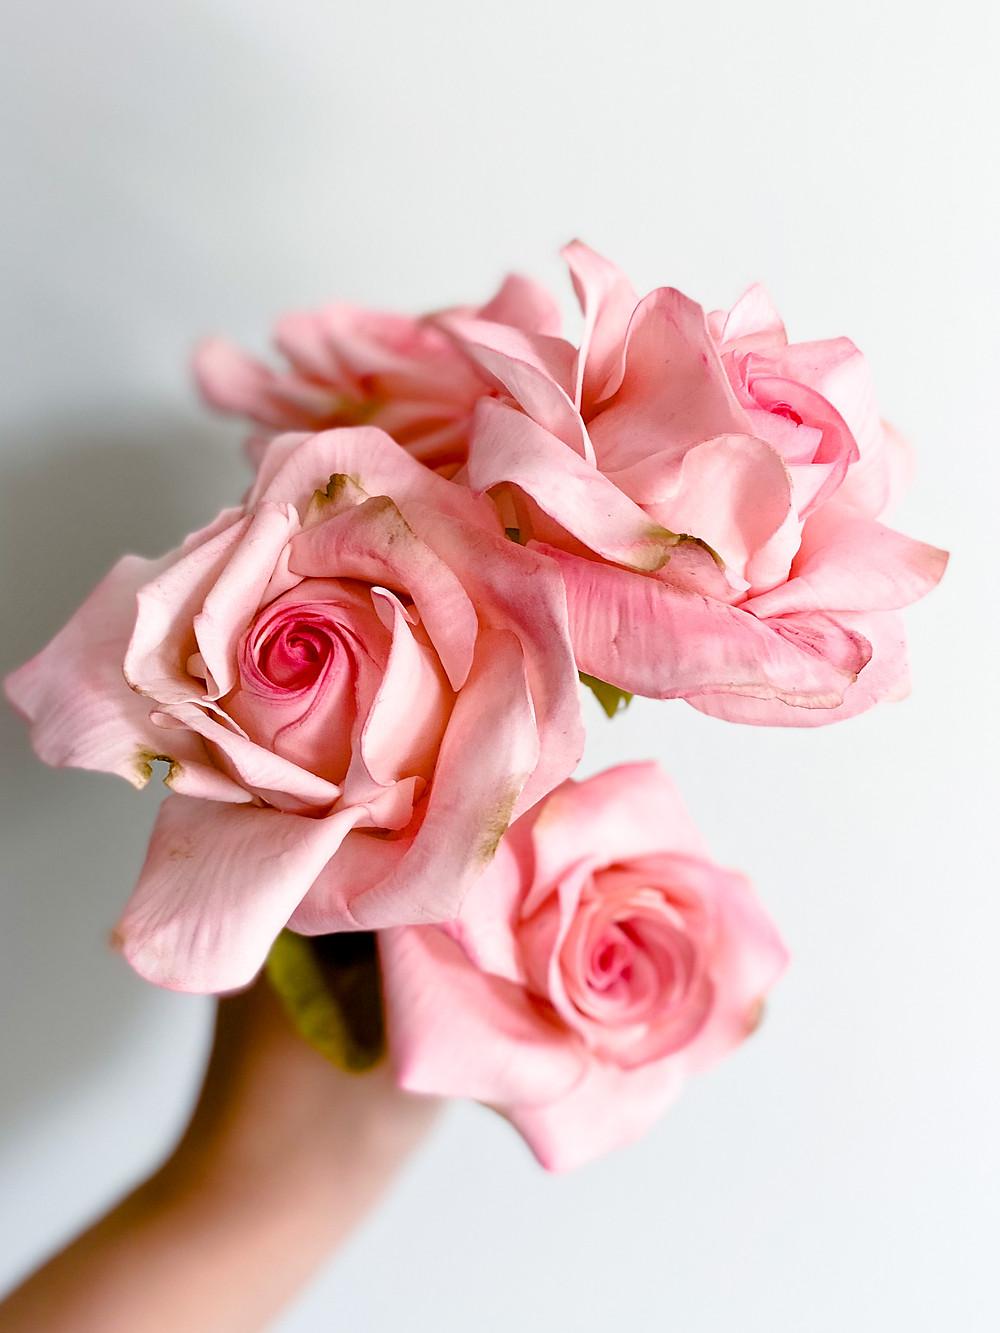 Sugar Flower Roses Made of Gum Paste Samantha Mayfair Cakes